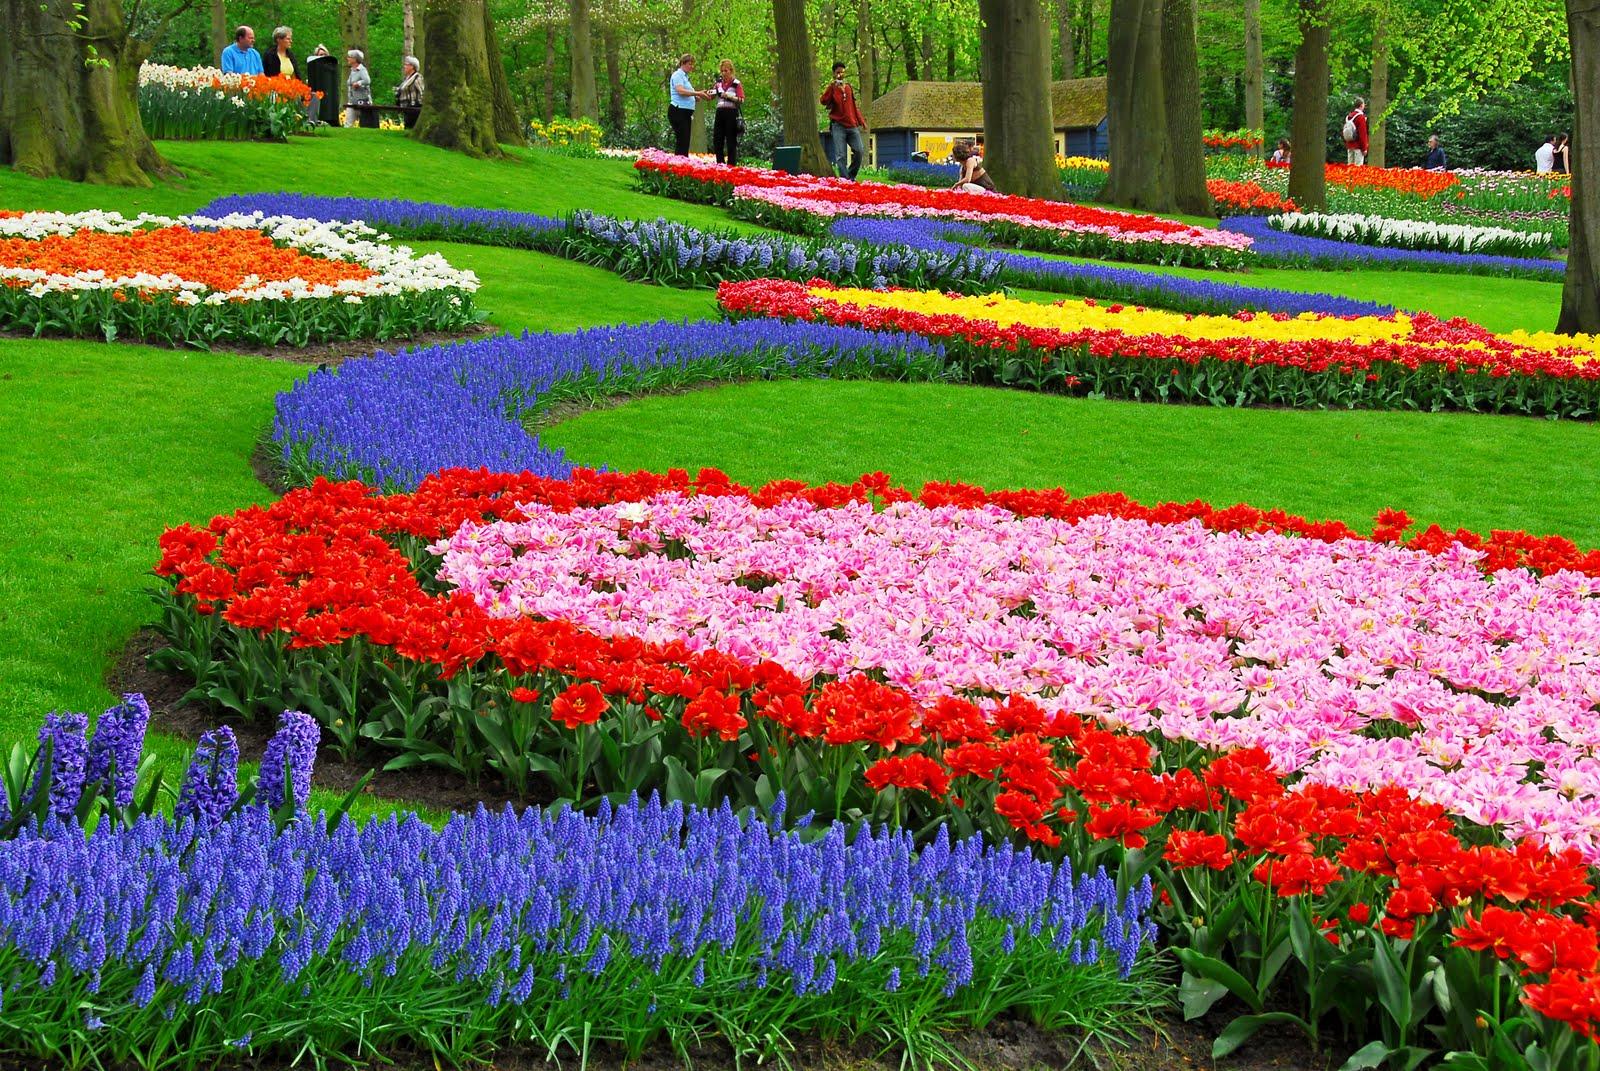 http://4.bp.blogspot.com/-T6irqEGb2Ew/T_ymjK_SbHI/AAAAAAAABLQ/V3FS-r19_yM/s1600/Keukenhof-Flowers-Garden.jpg